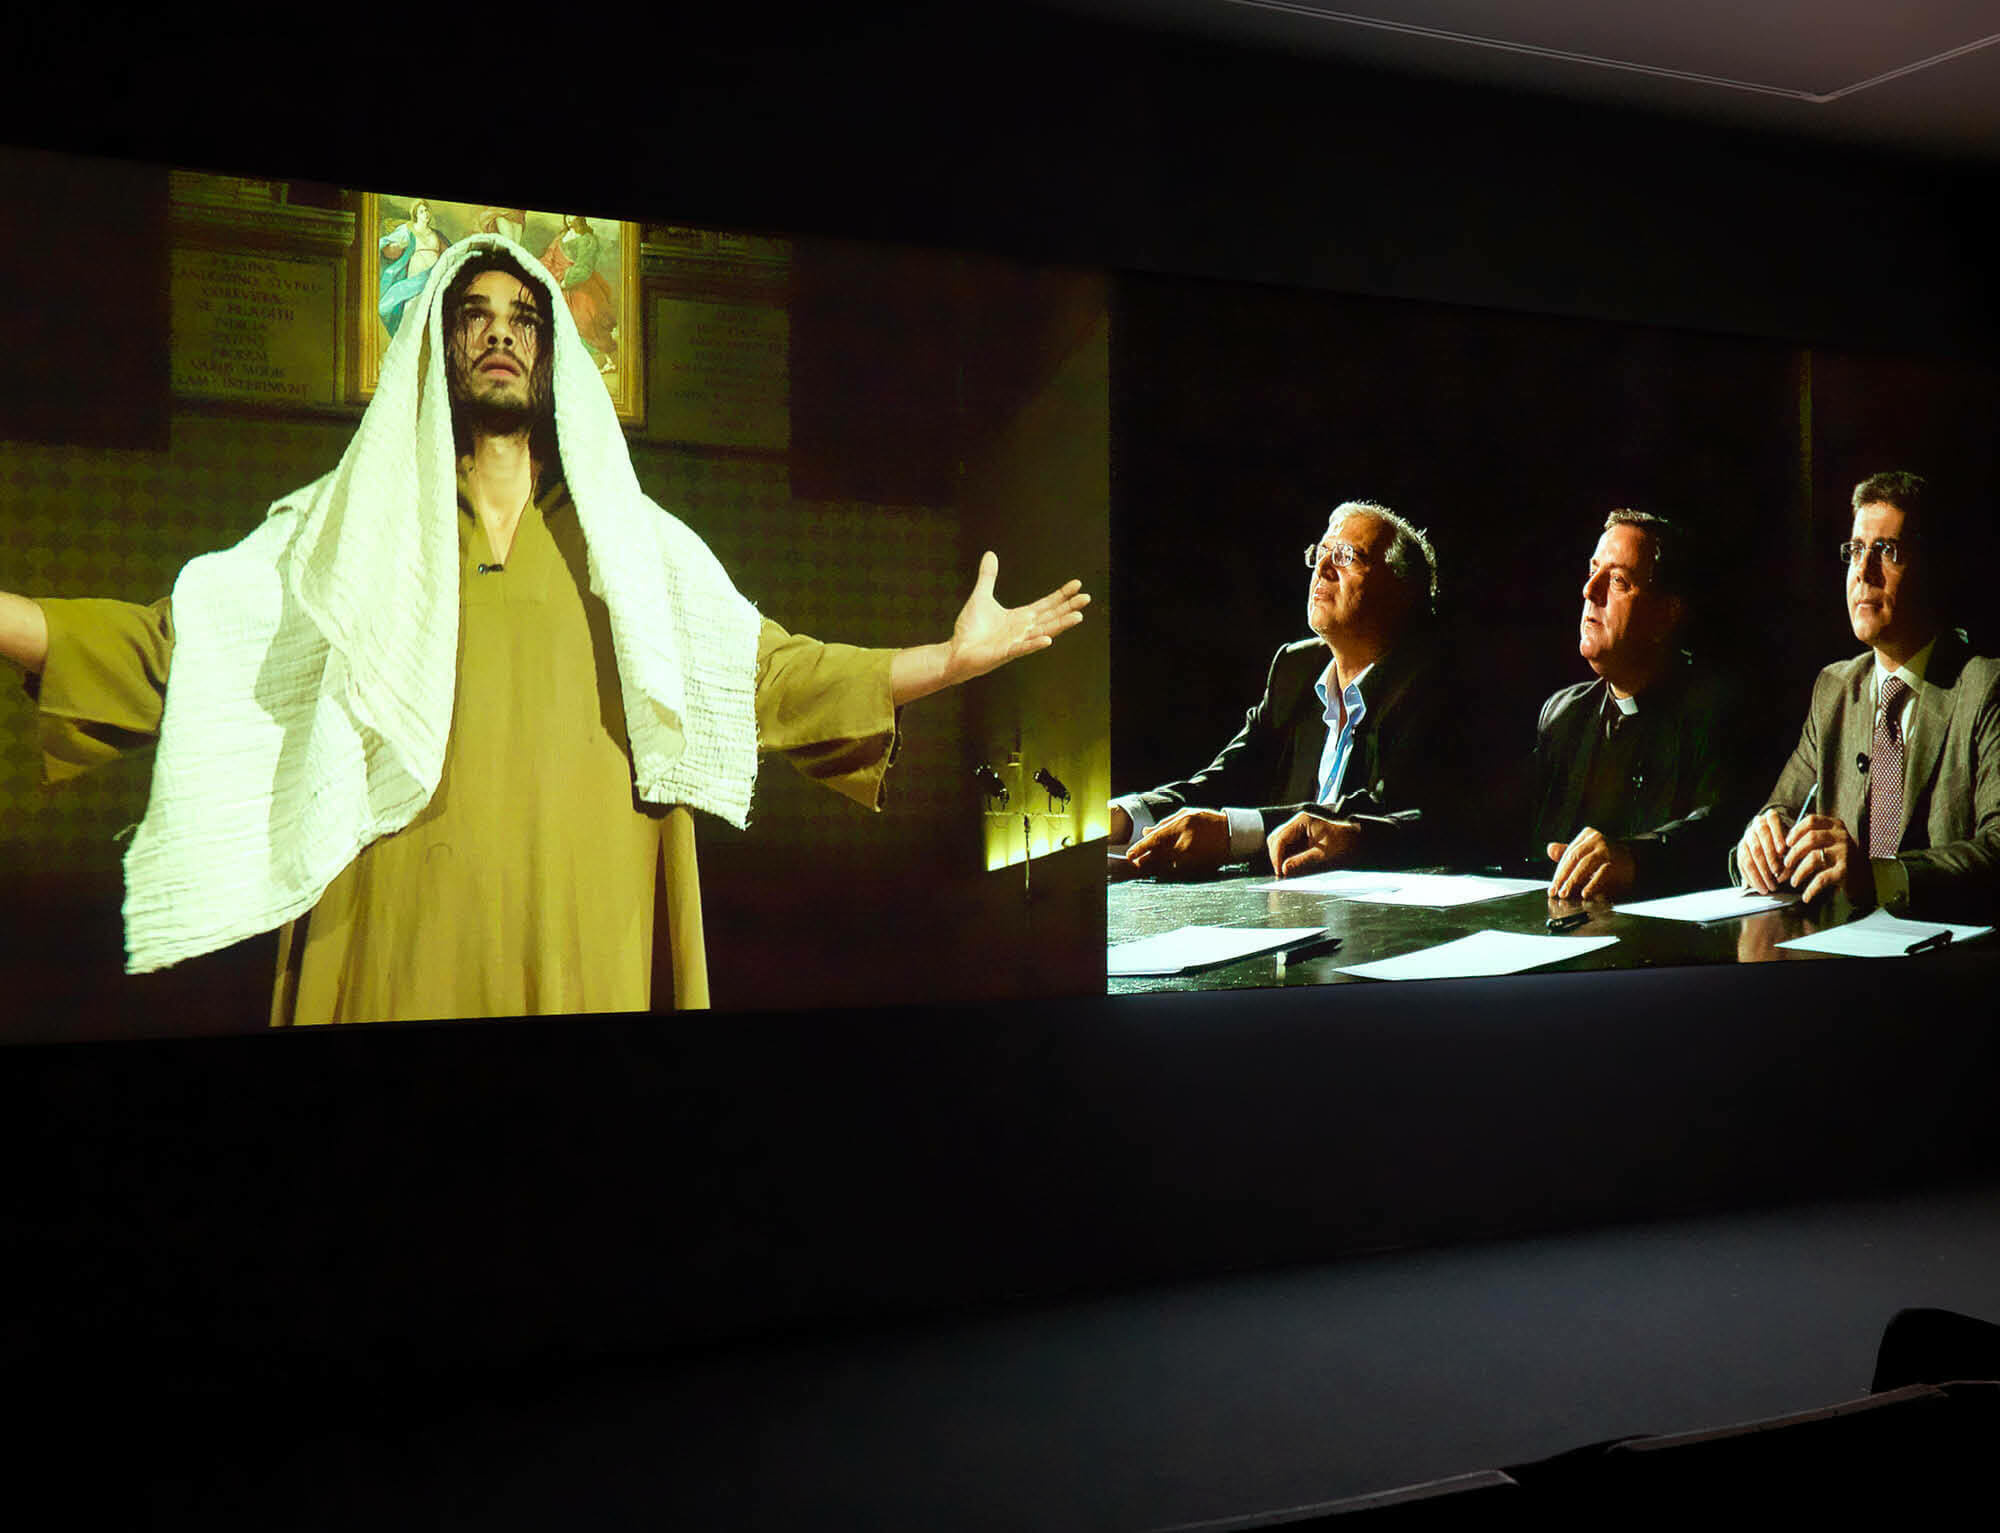 Spotlight Screenings: Casting Jesus by Christian Jankowski